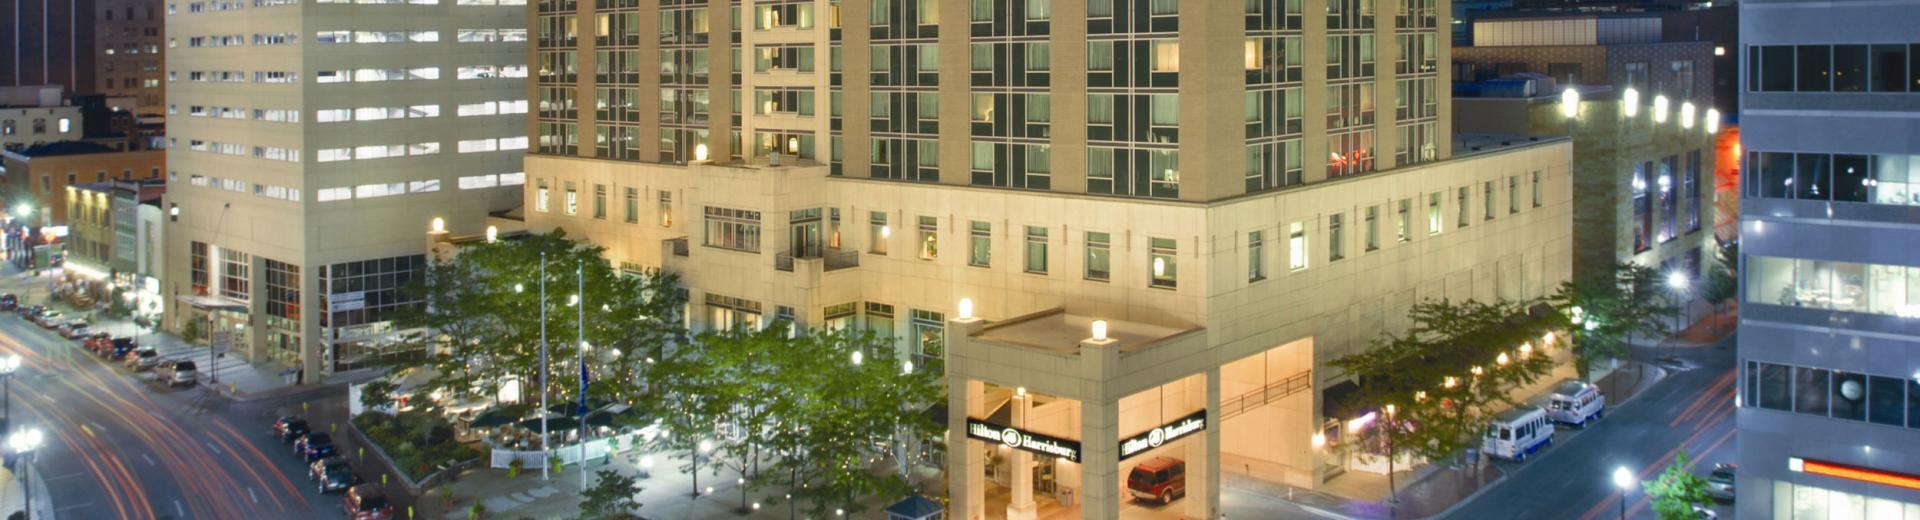 Hershey hotel exterior